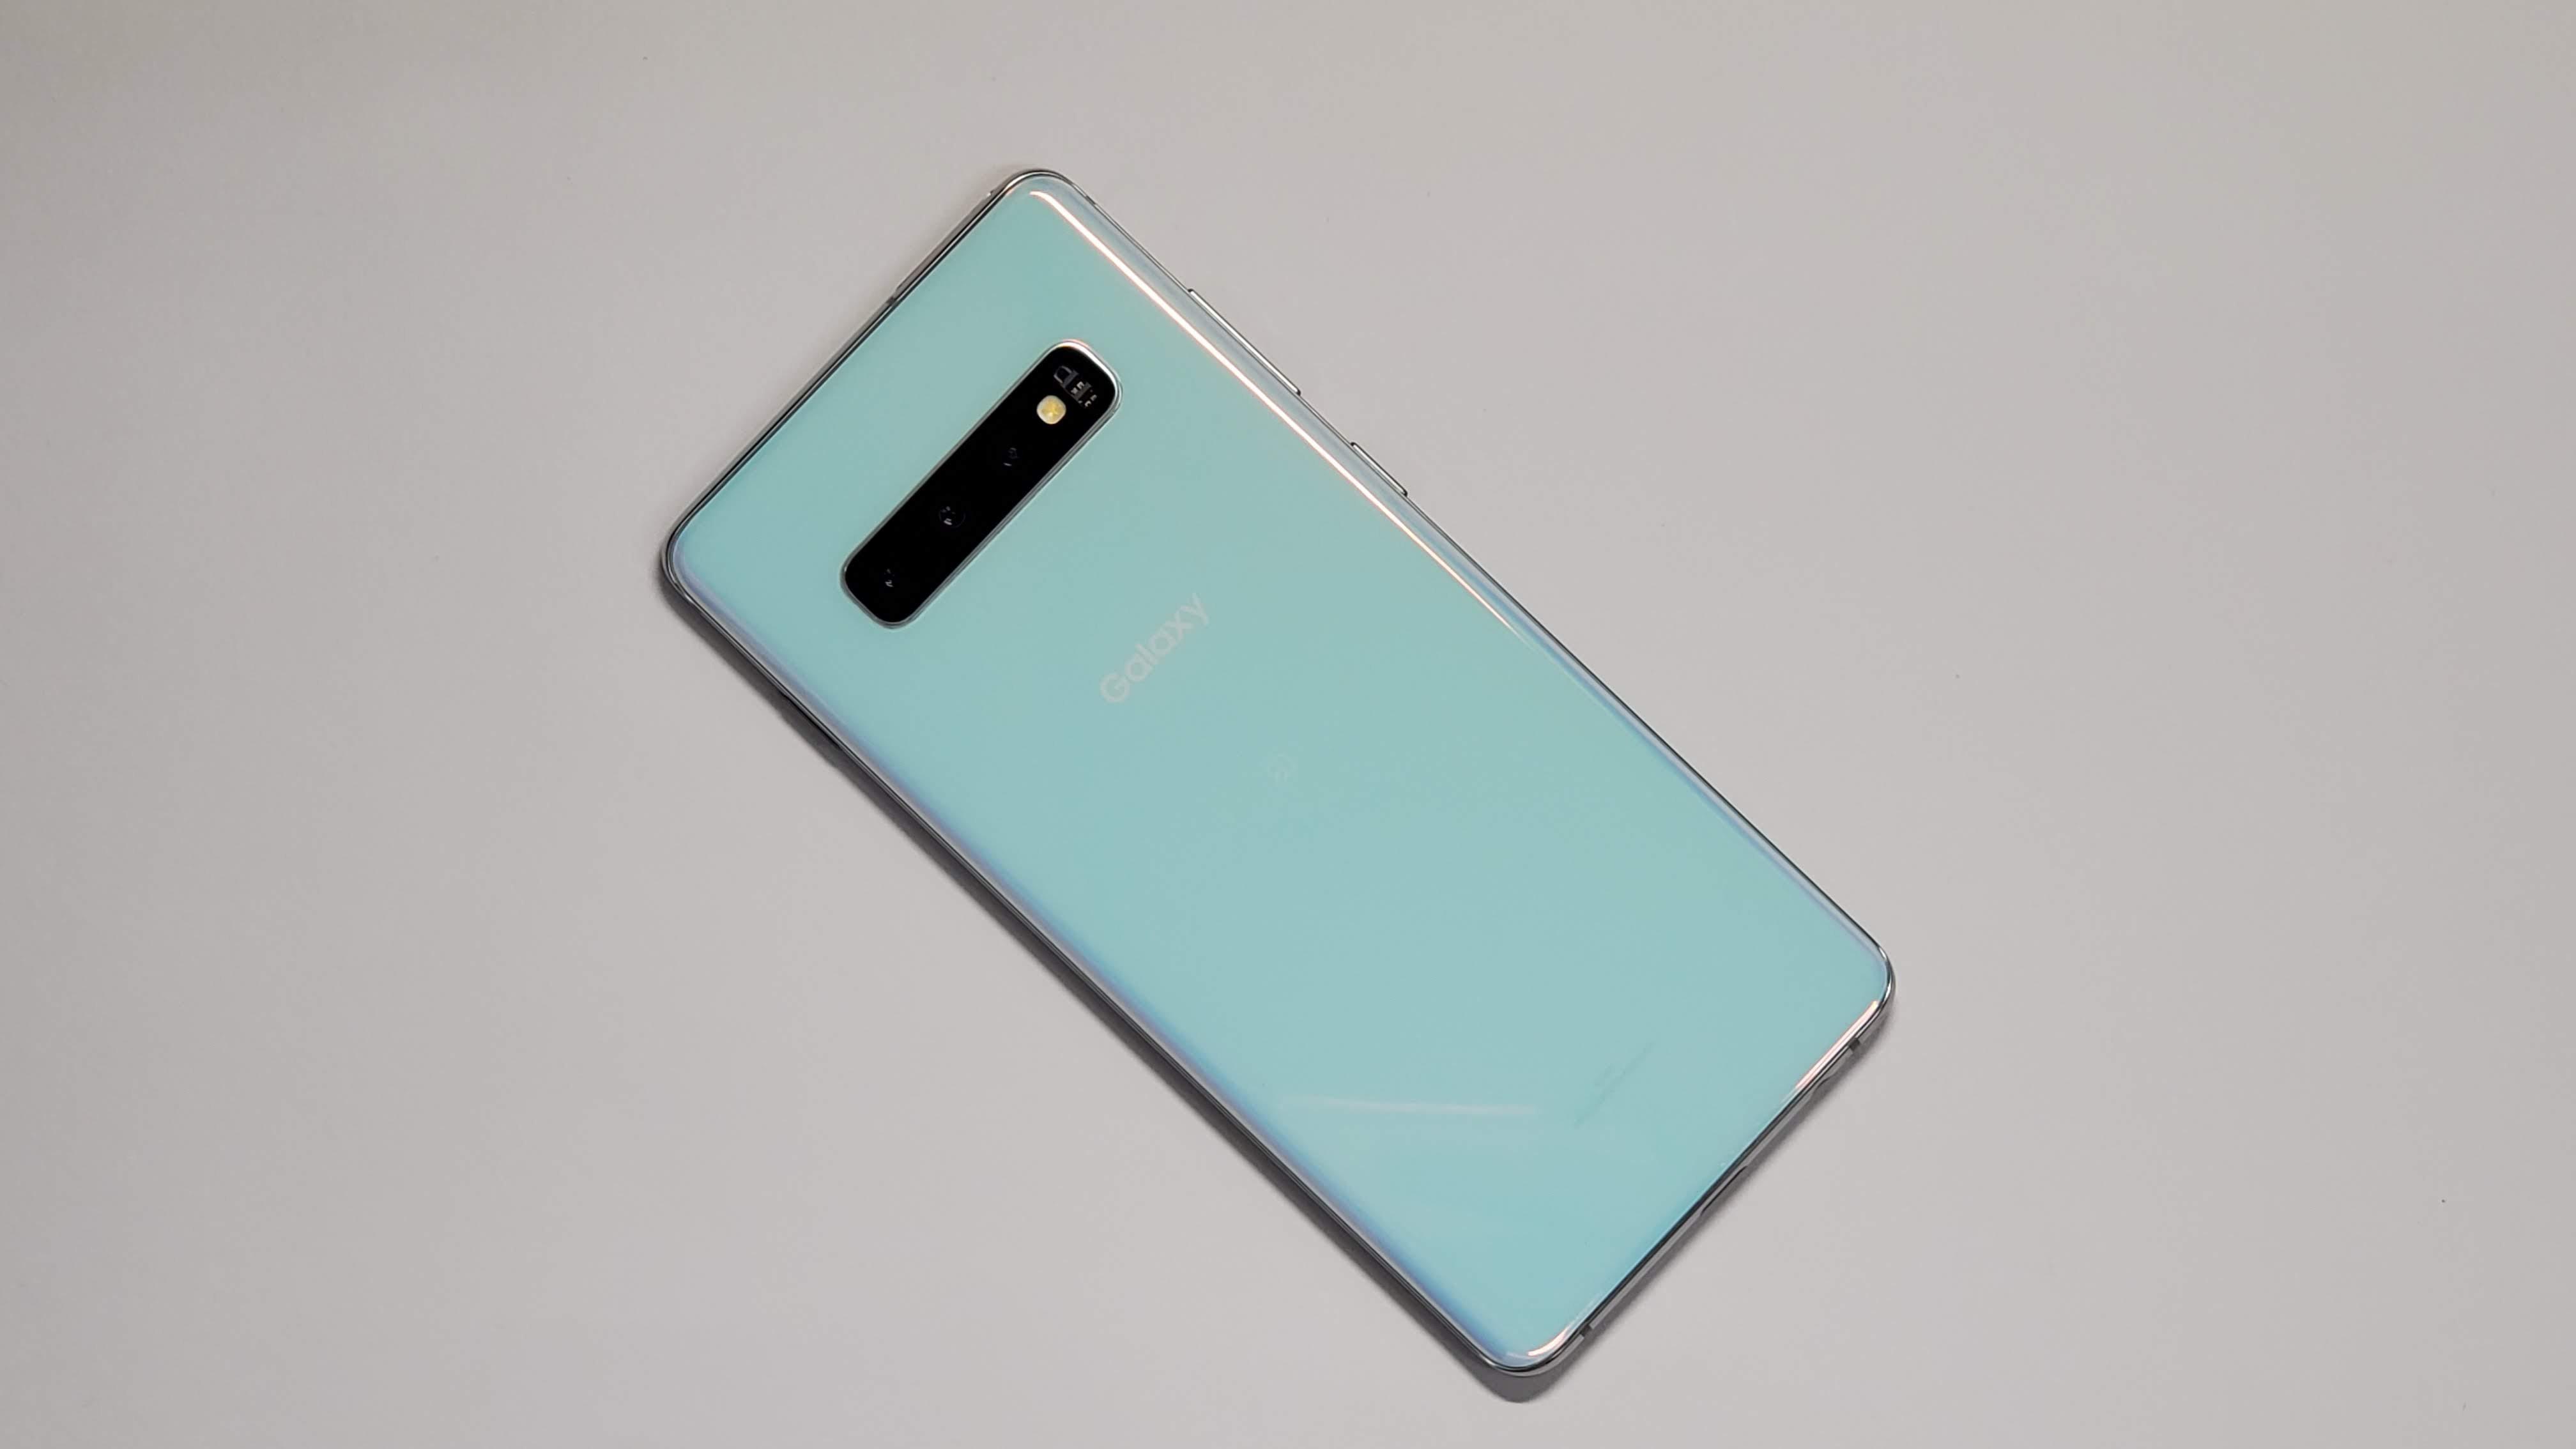 Samsung Galaxy S10+ 徹底レビュー┃カメラ、電池持ち、Galaxy Note10+との違い